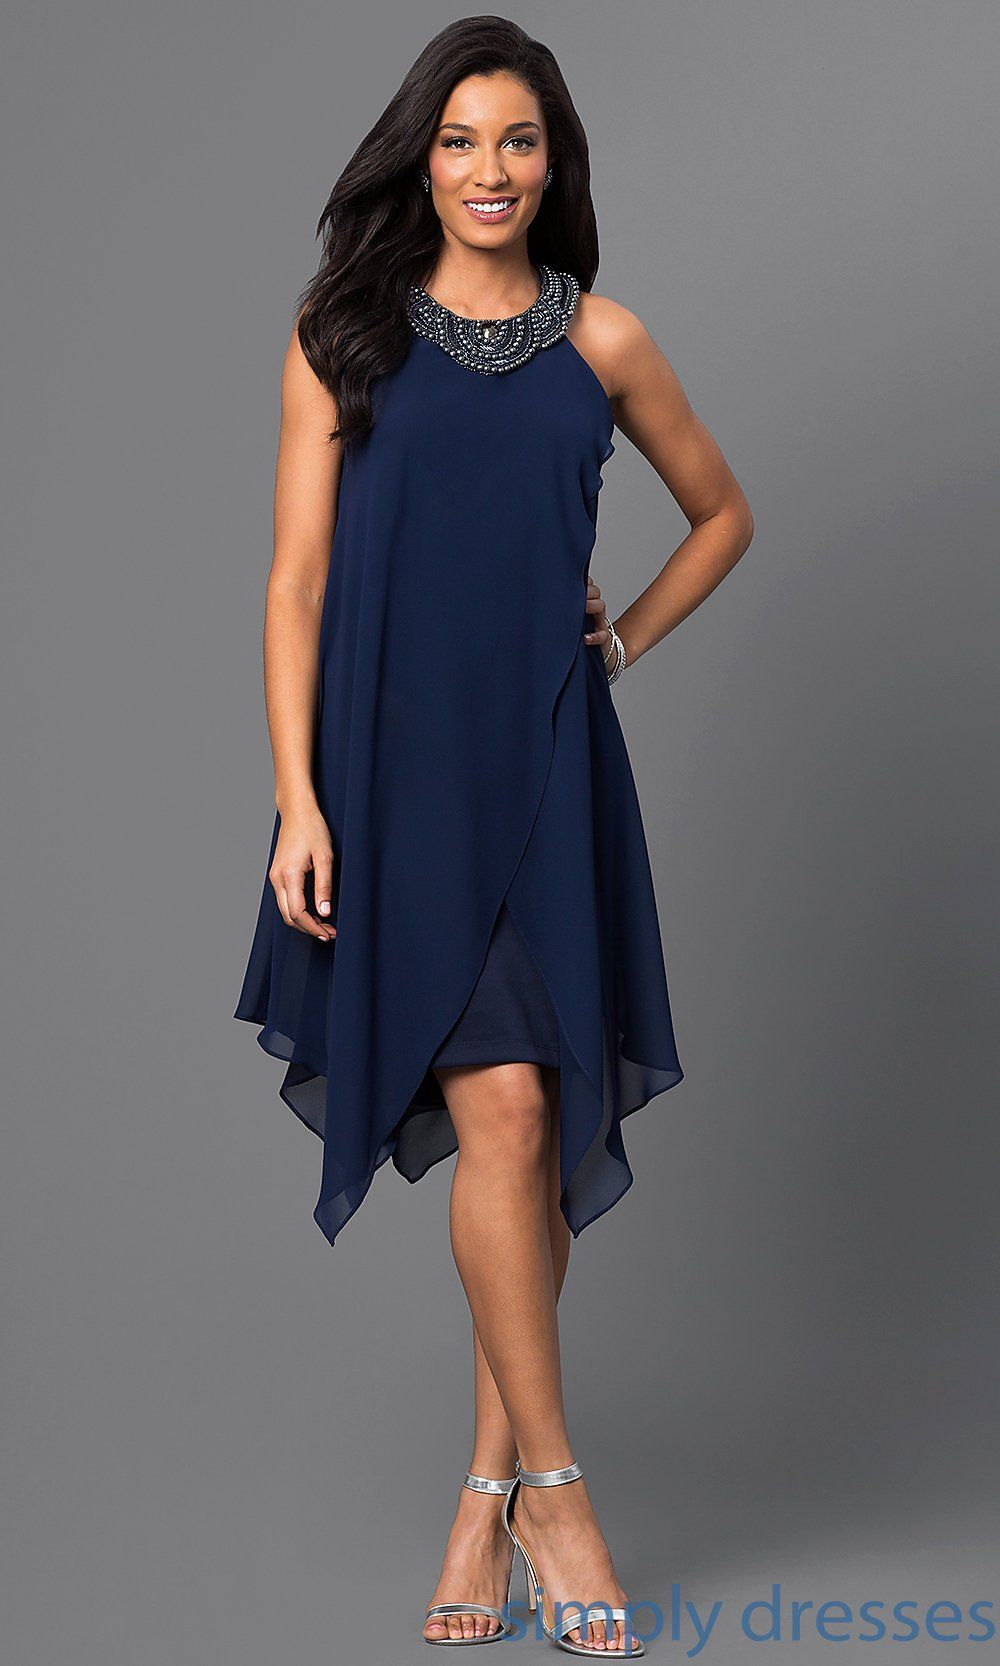 Sleeveless navy blue dress with handkerchiefemi gear u online store